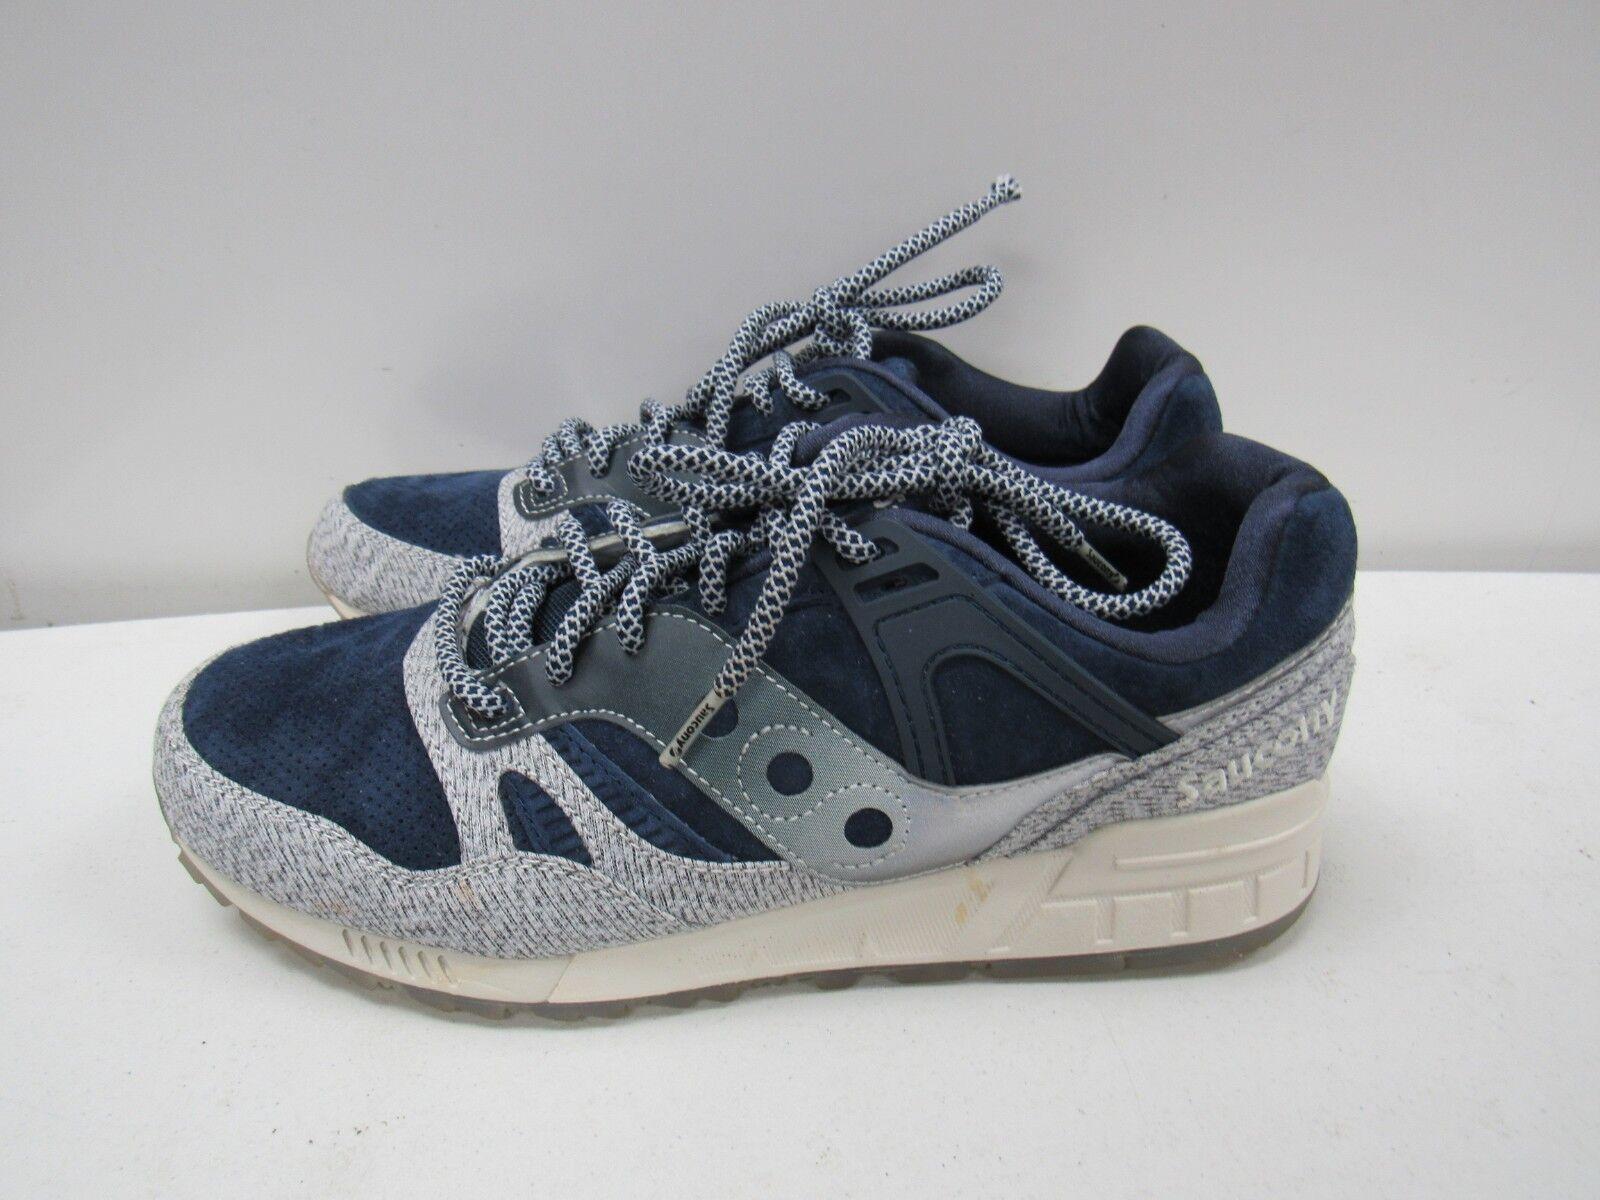 84552e3f168 Zapatilla S703161 Grid 8000 shoes sz 11M L21 SAUCONY Saucony ...